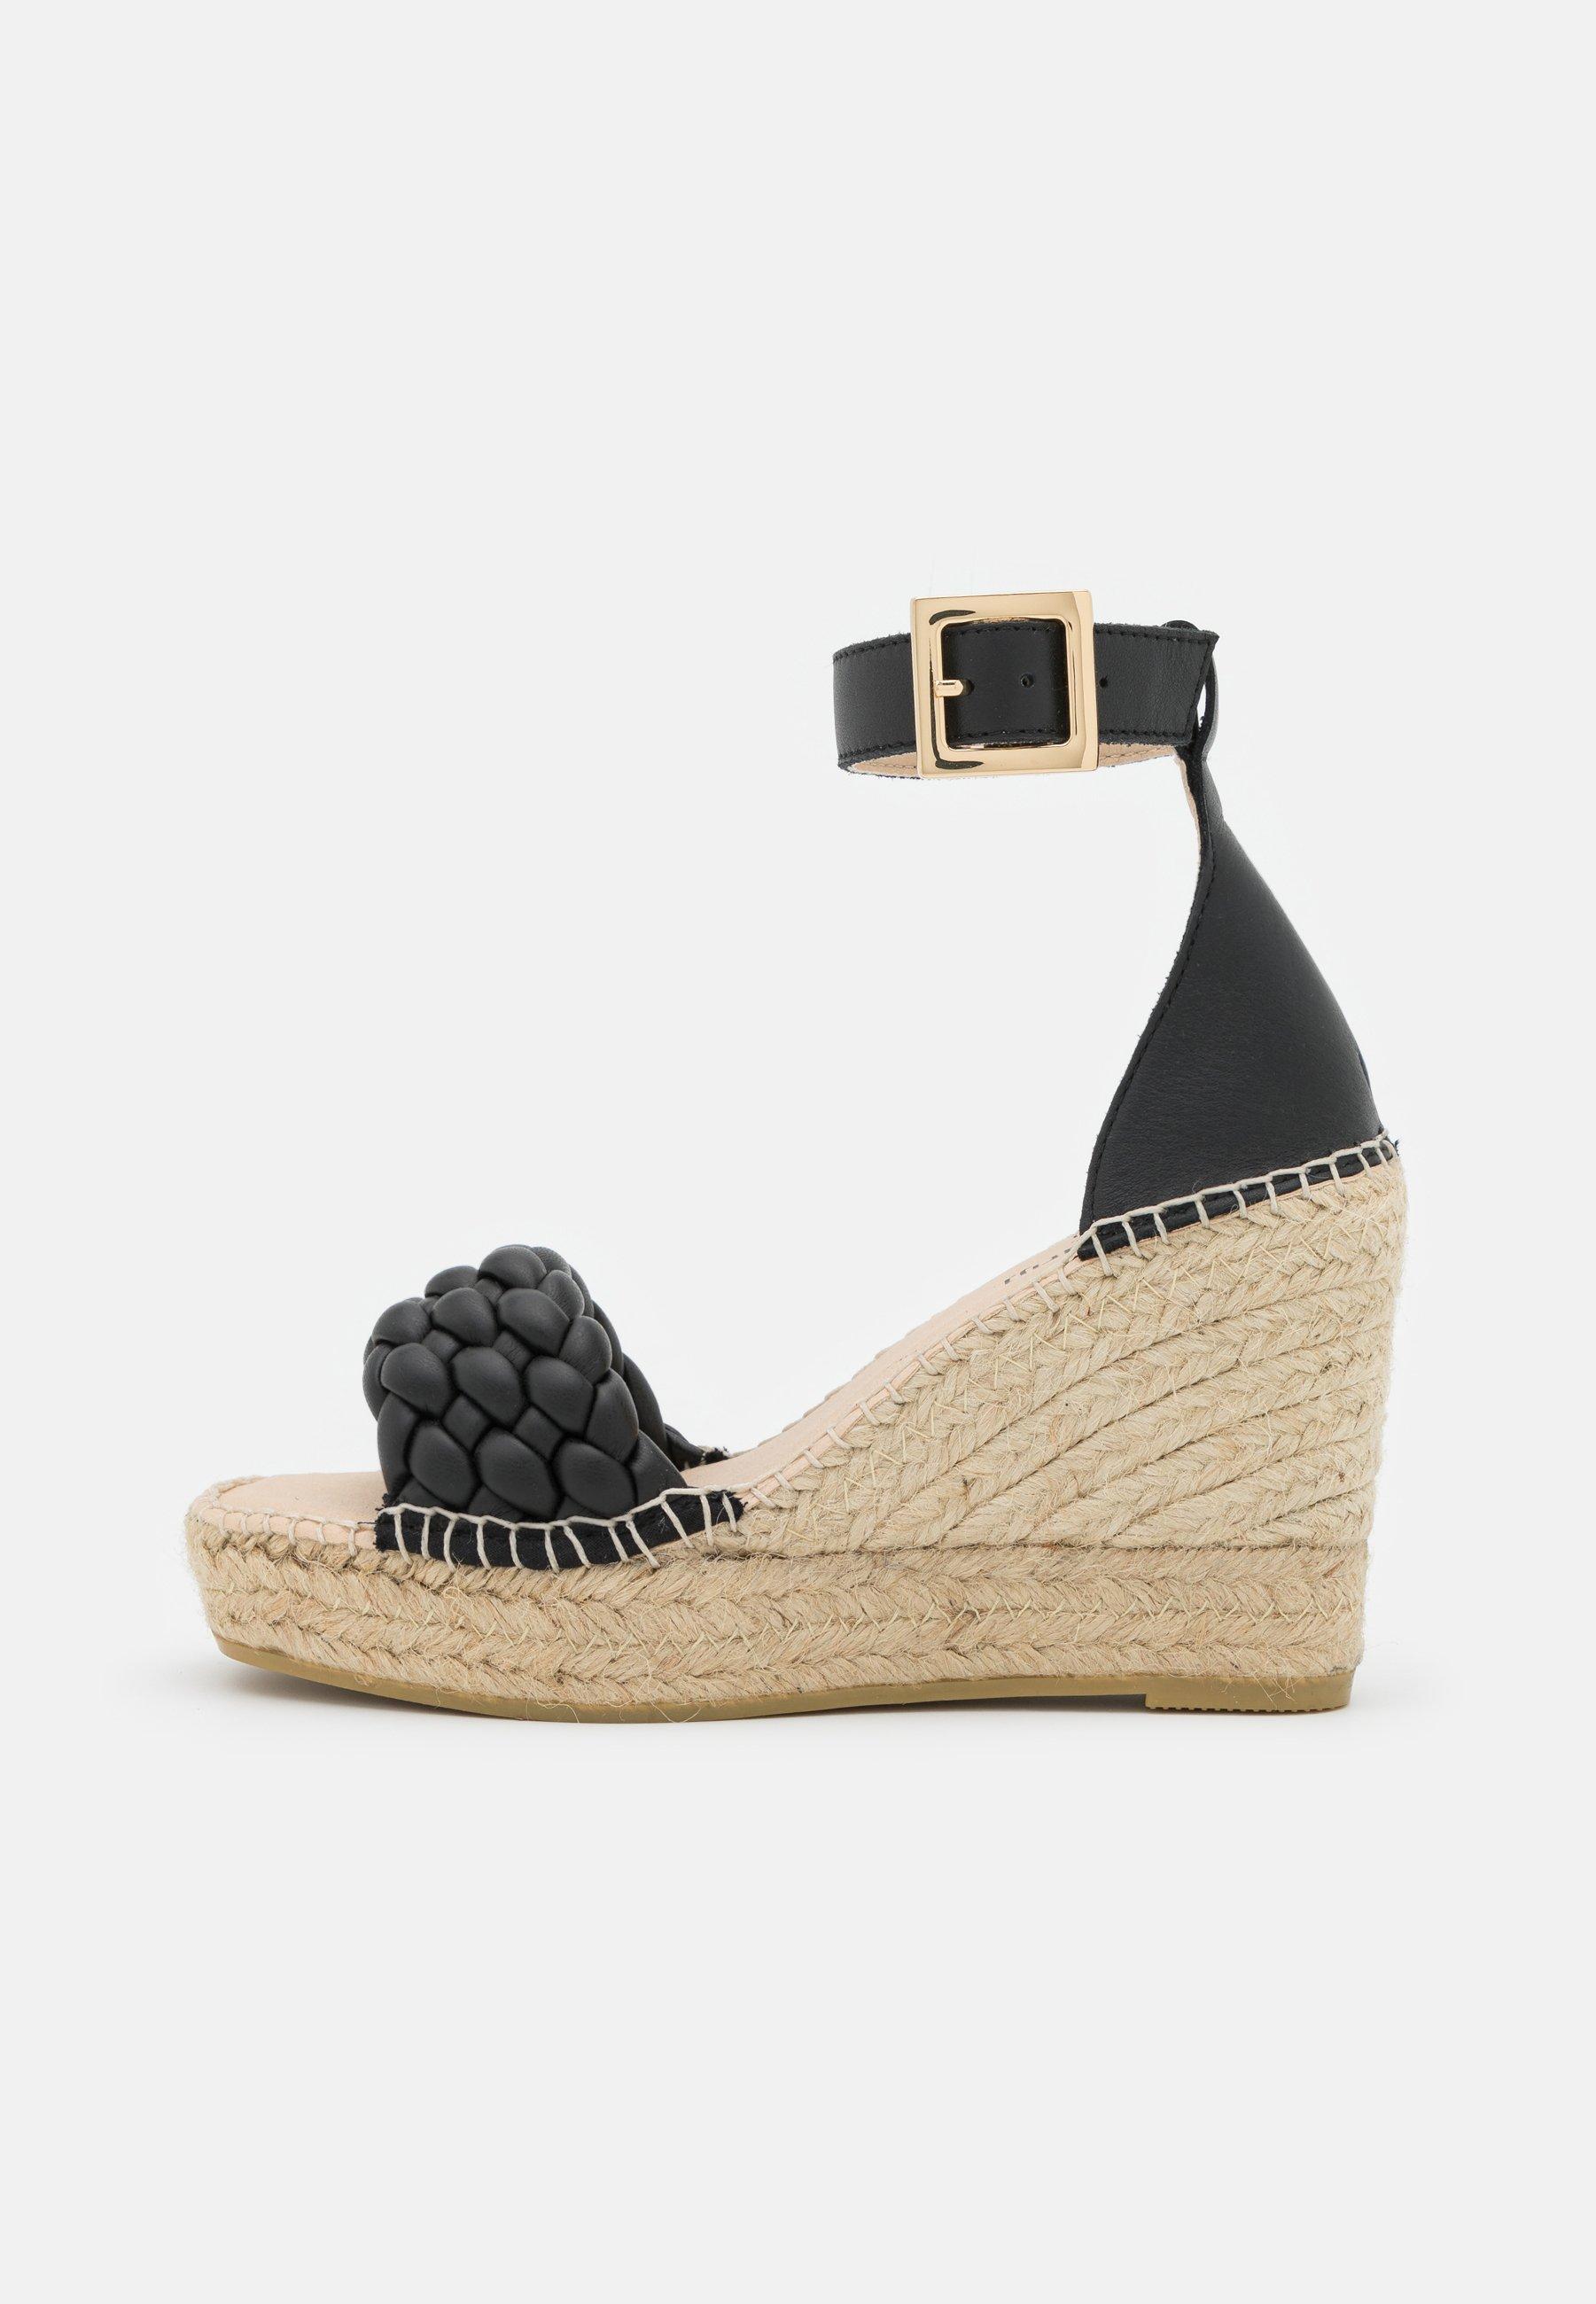 Damen ST. TROPEZ - Platform sandals - High Heel Sandalette